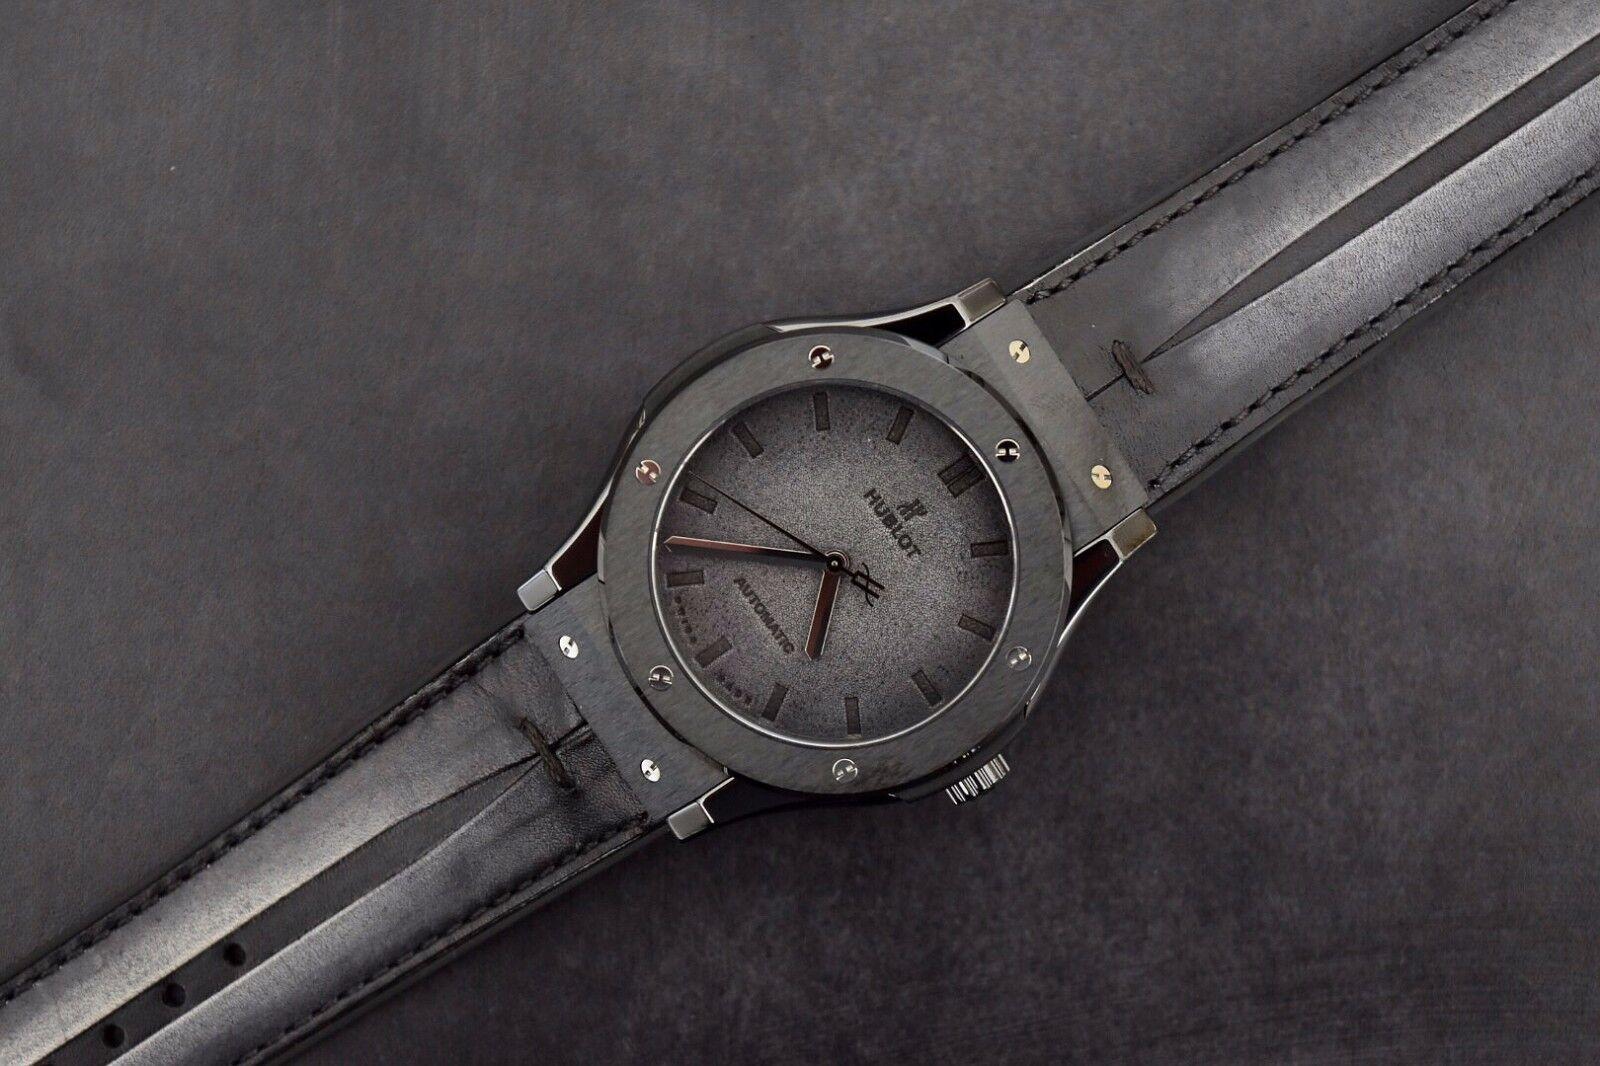 Hublot Classic Fusion Limited Edition Berluti All Black Ceramic Automatic Watch - watch picture 1